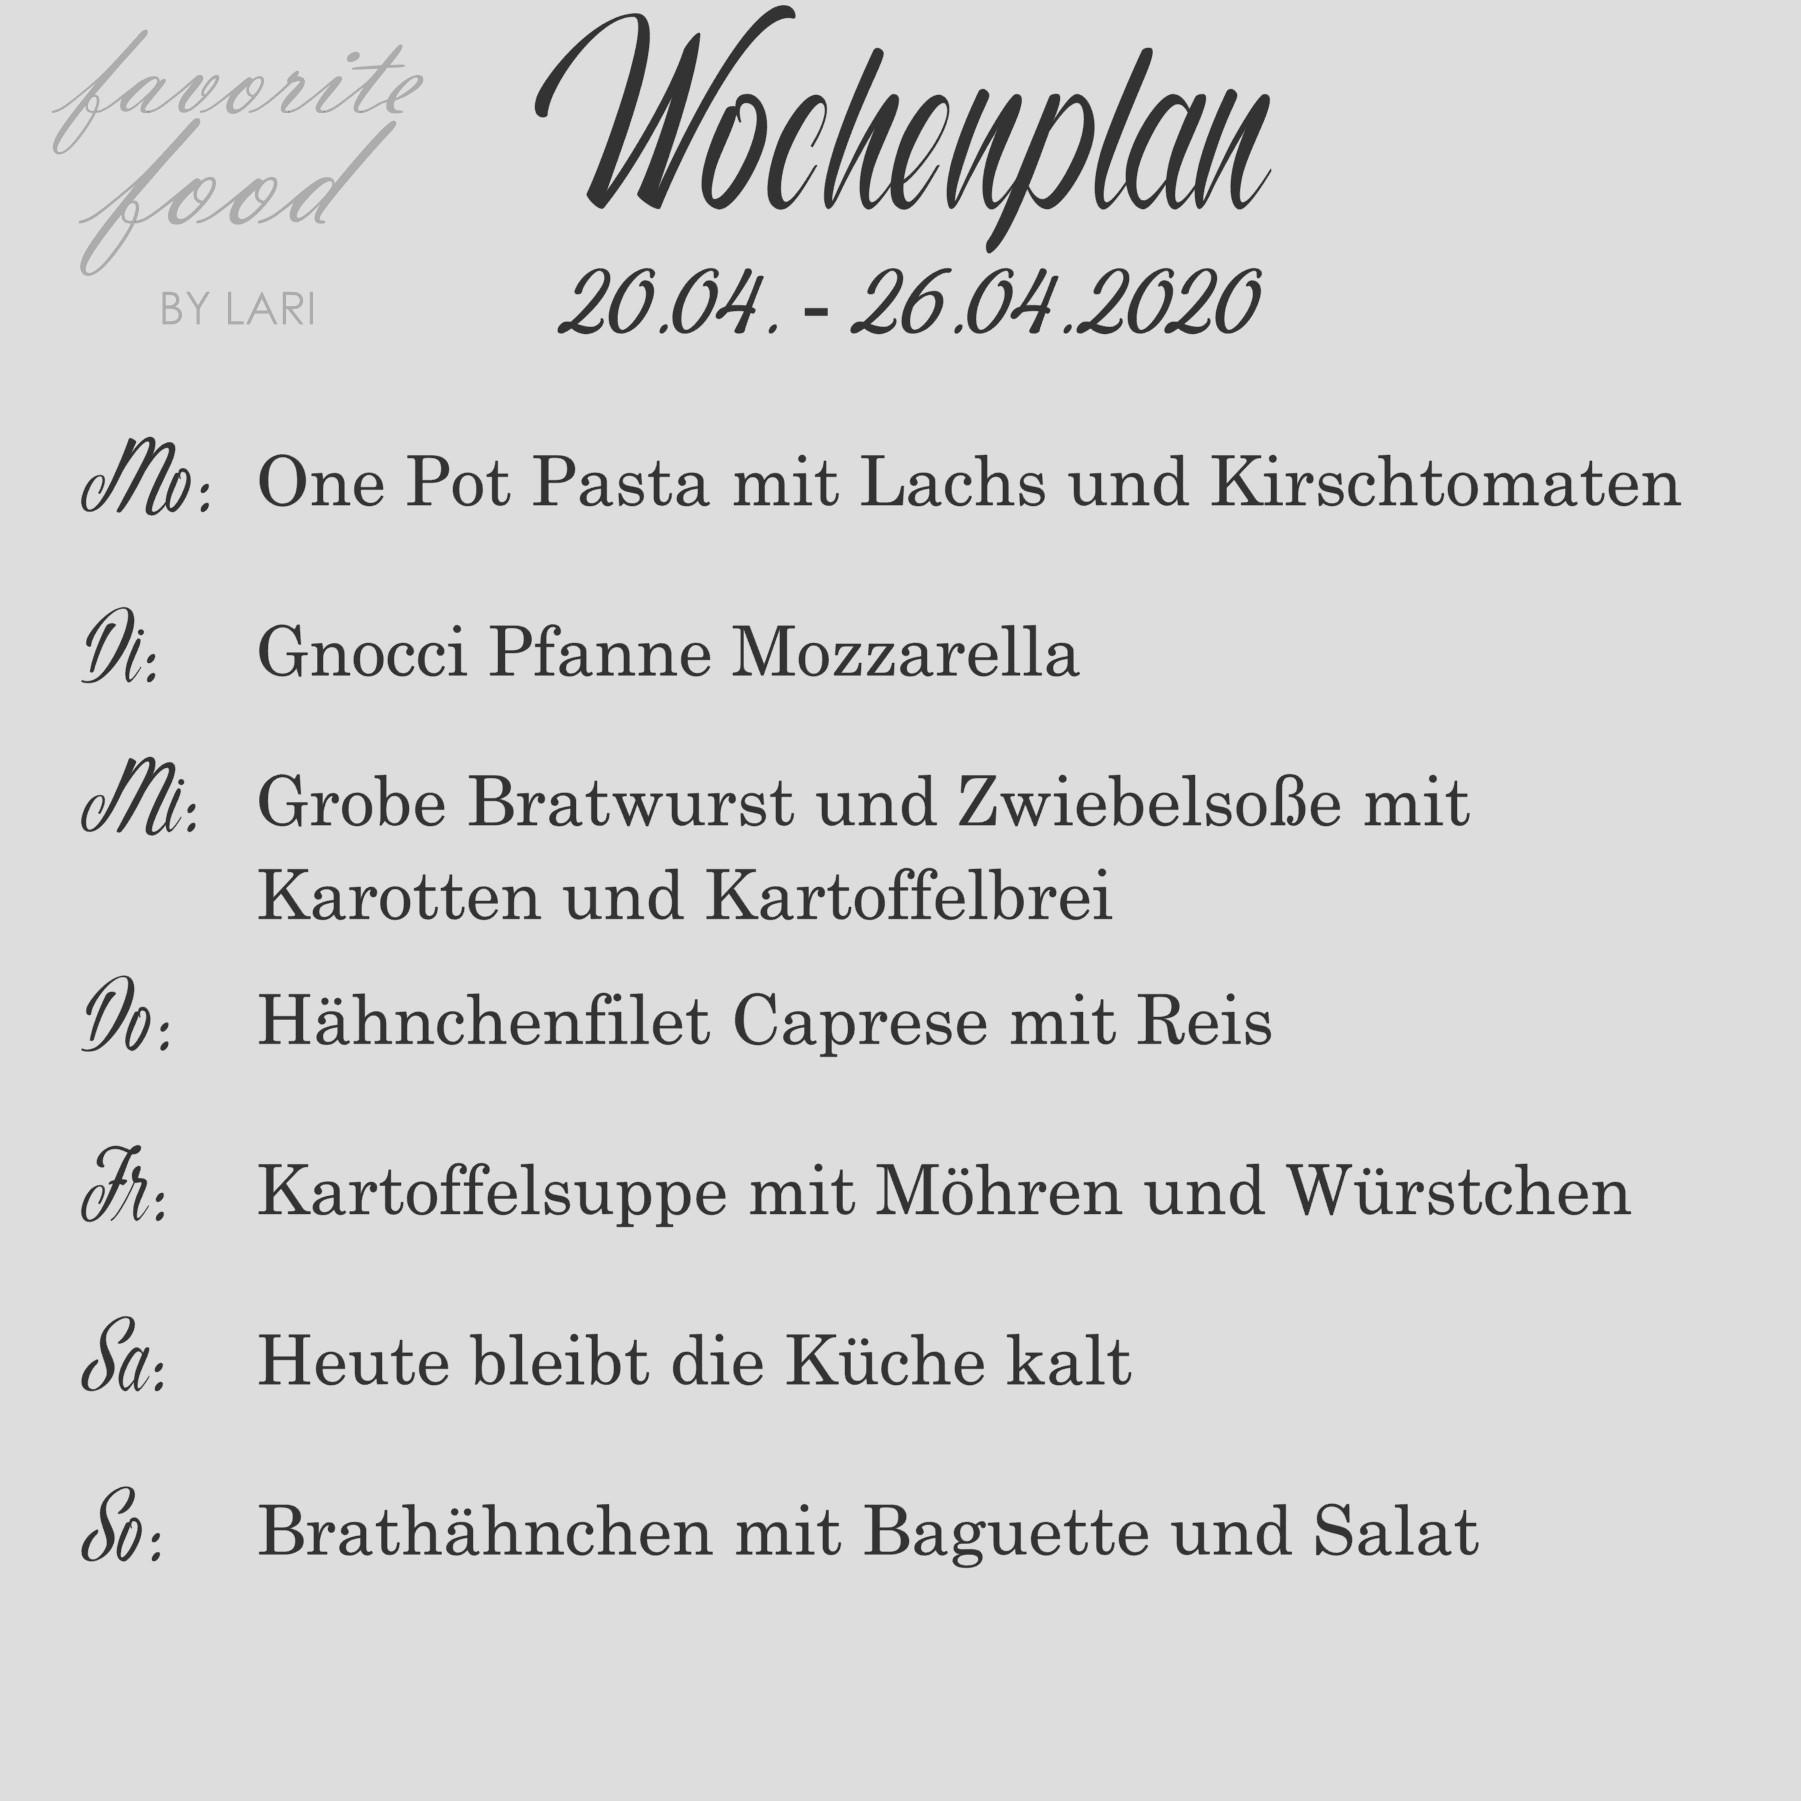 Wochenplan 20.04. – 26.04.2020